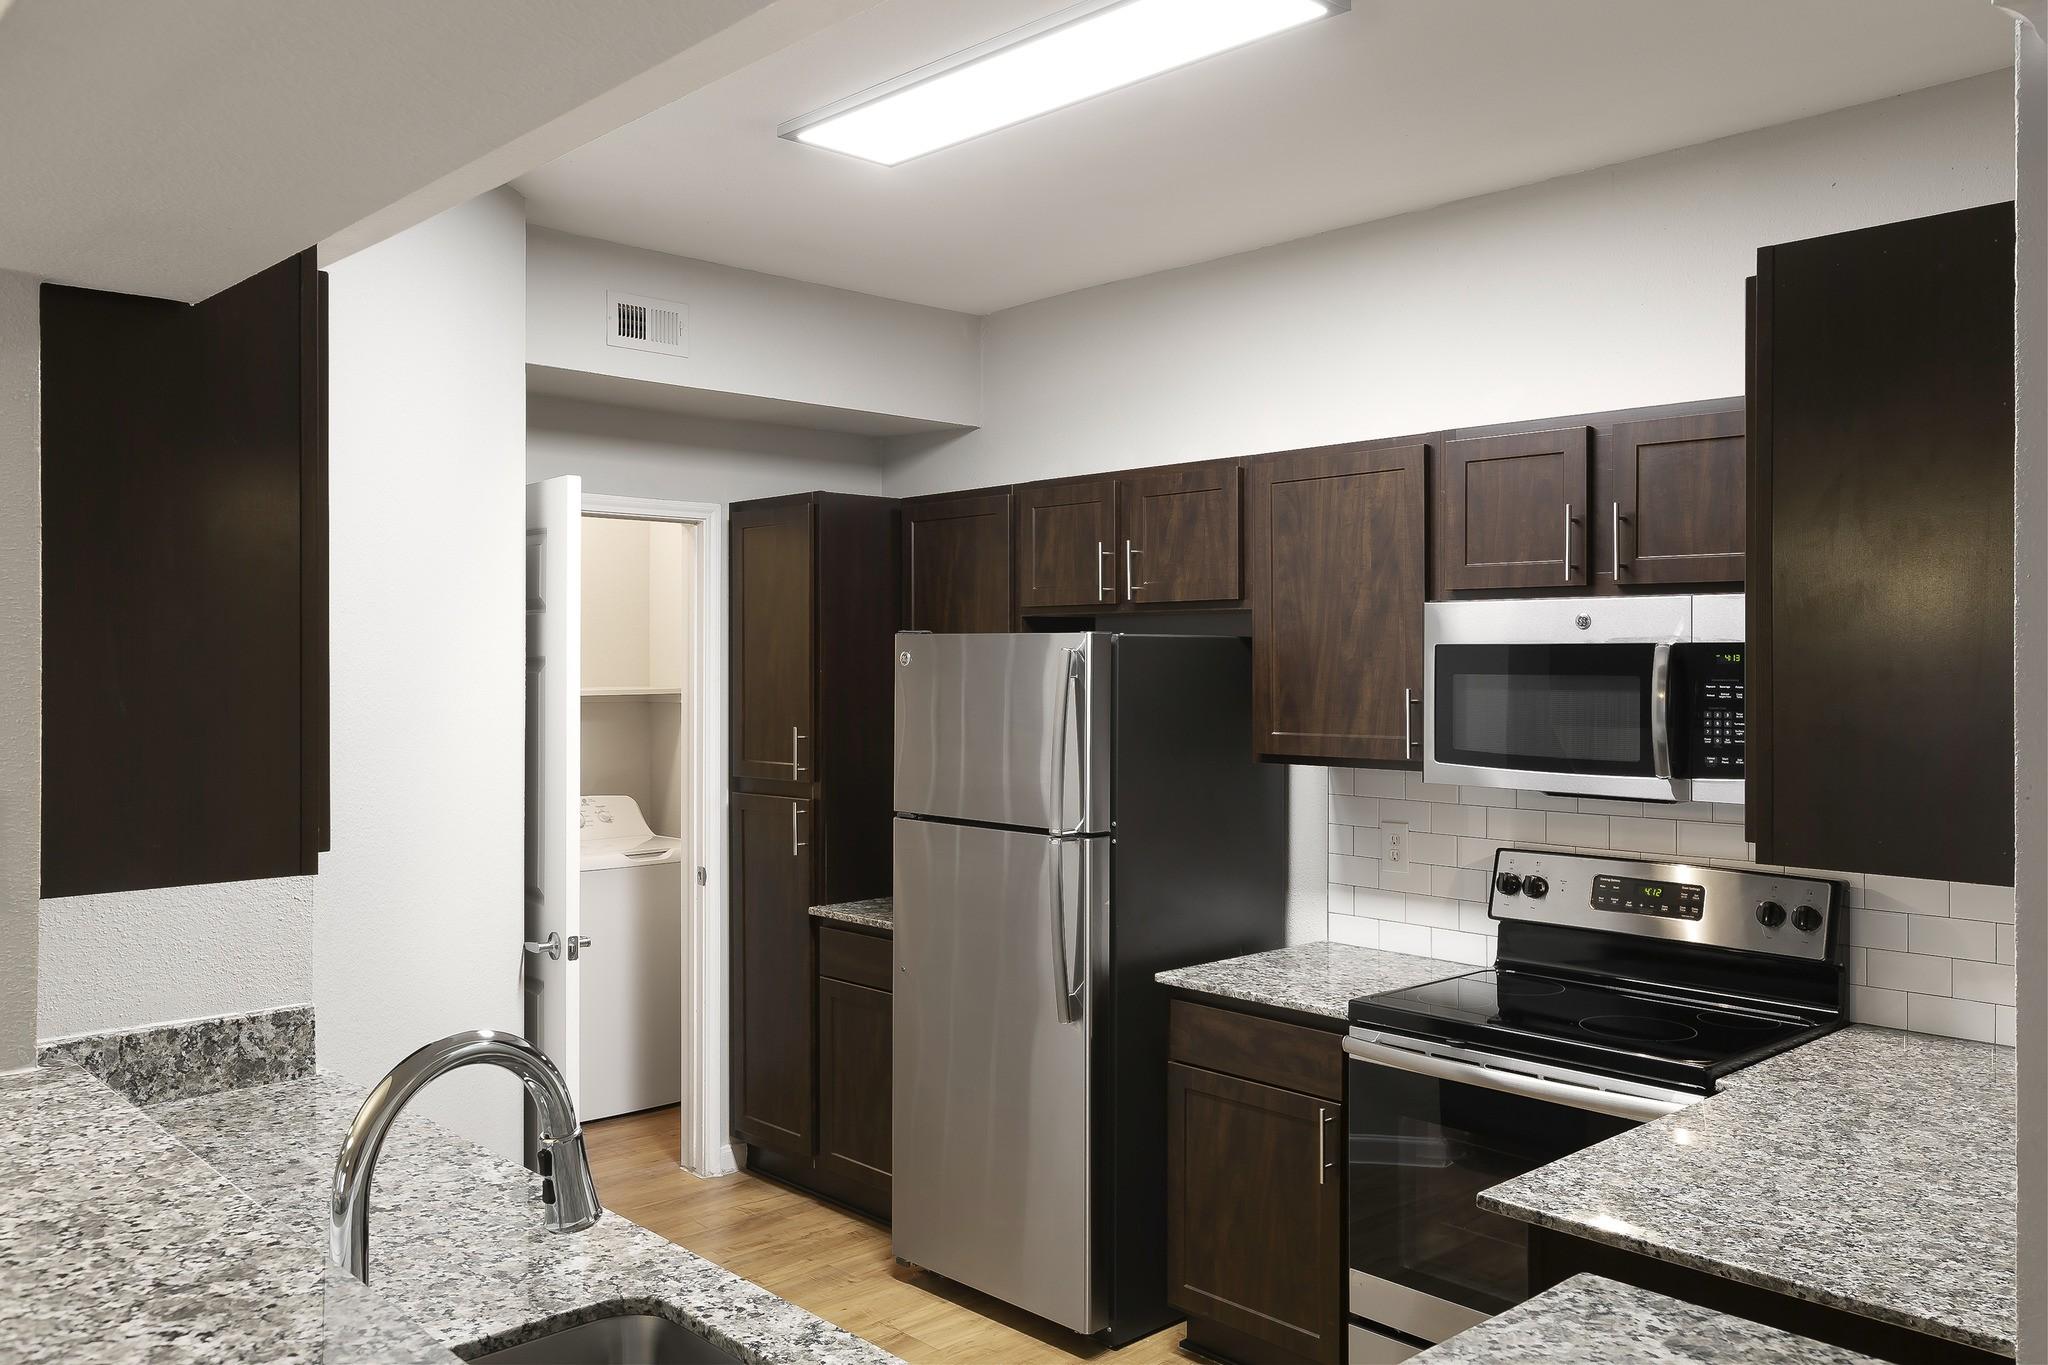 Apartments Near UT Austin Gables Central Park Texas for University of Texas - Austin Students in Austin, TX